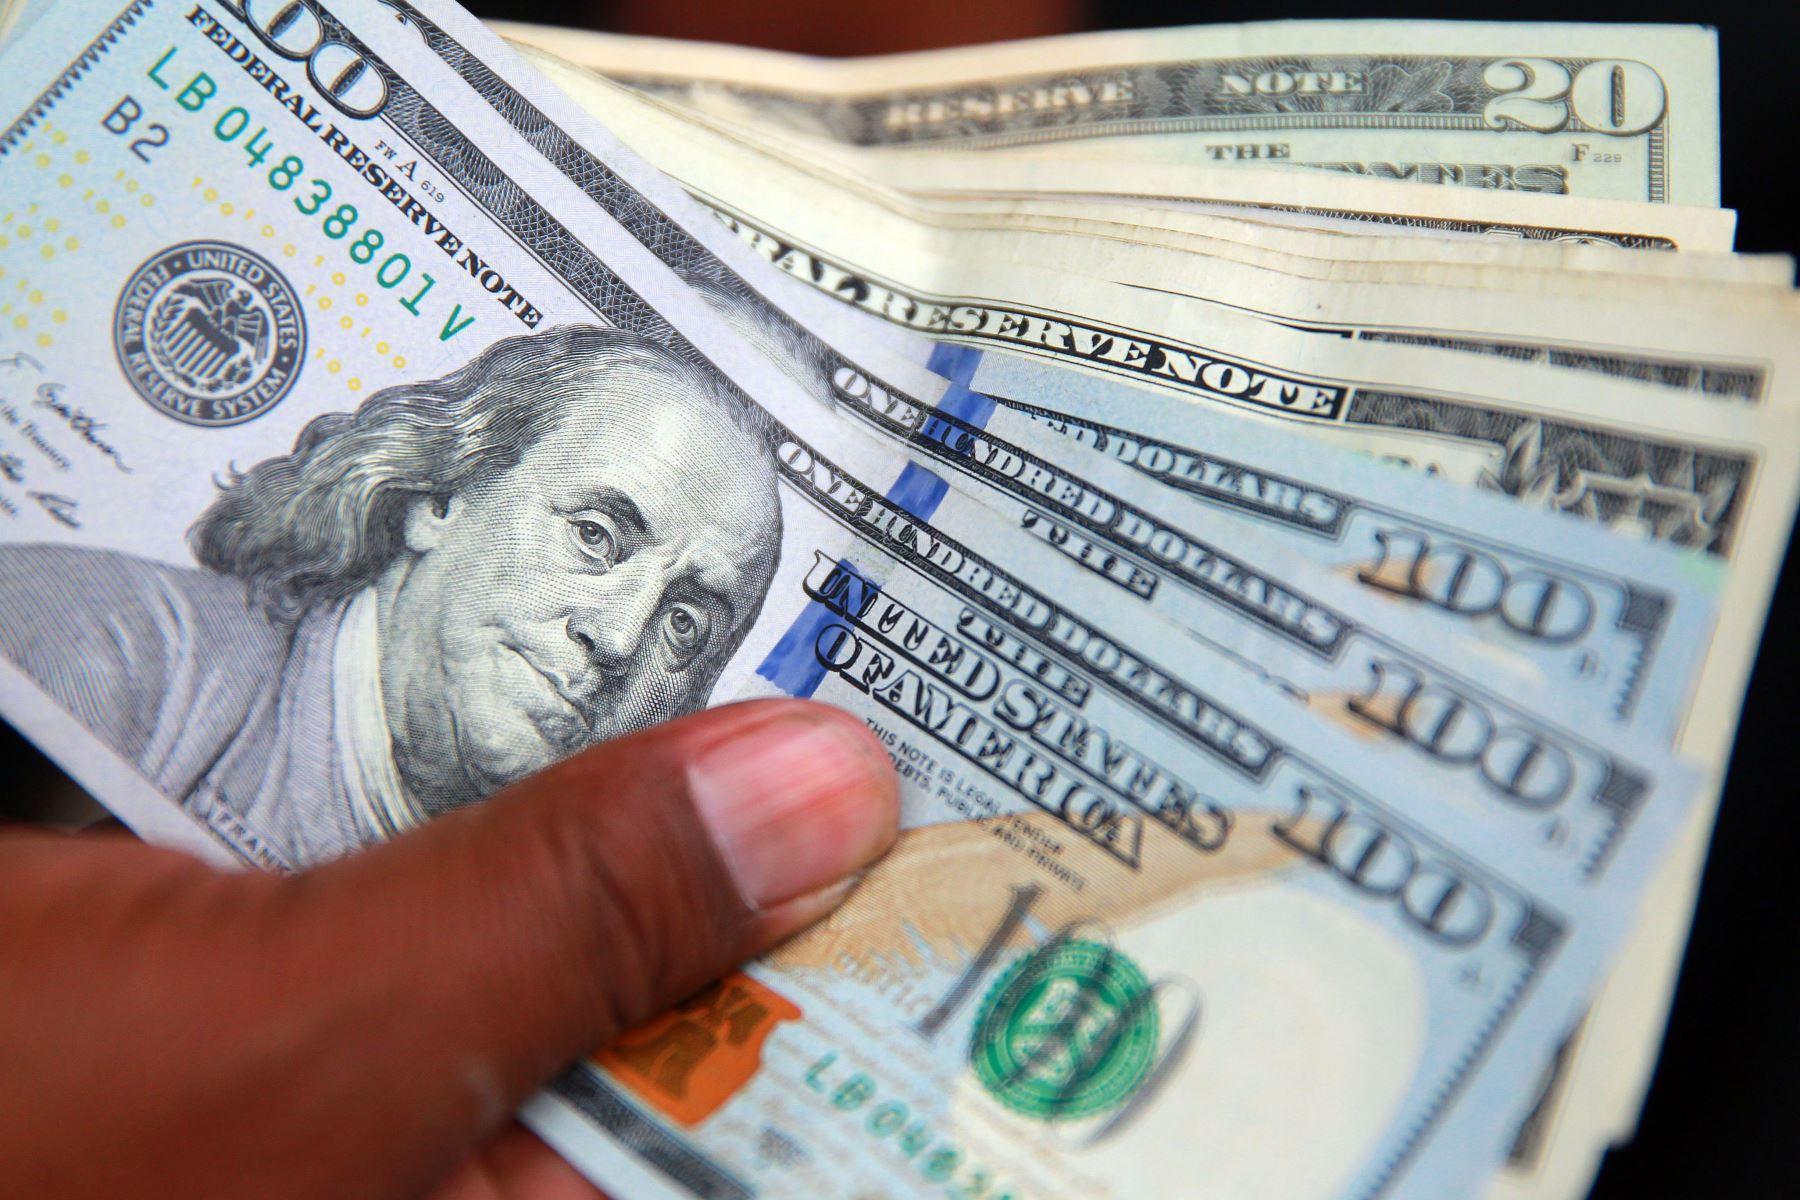 bcr-dolarizacion-en-creditos-privados-se-redujo-a-26-en-diciembre